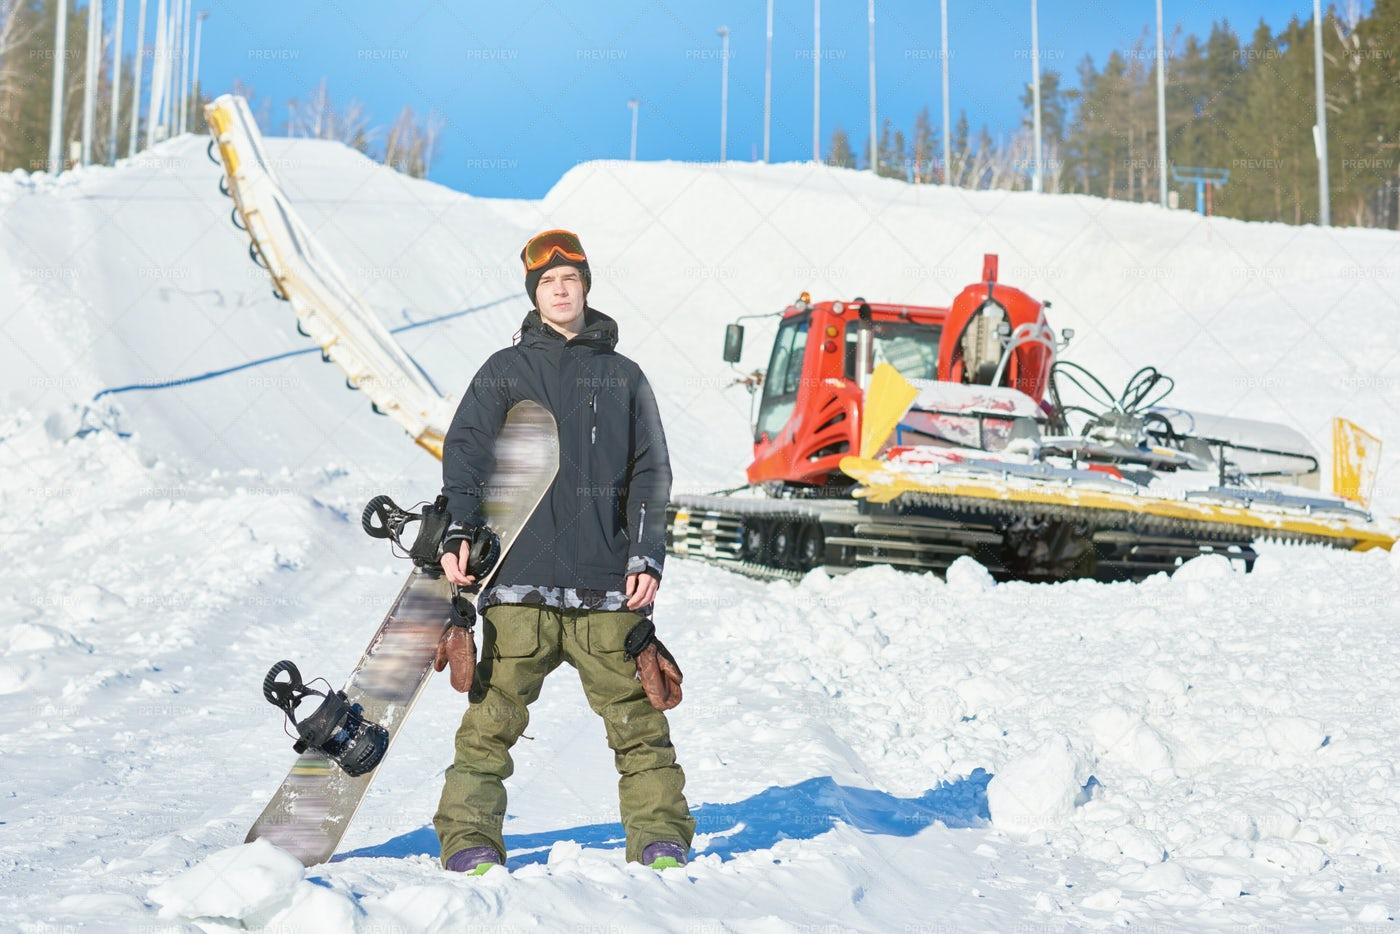 Snowboarder Posing On Piste: Stock Photos